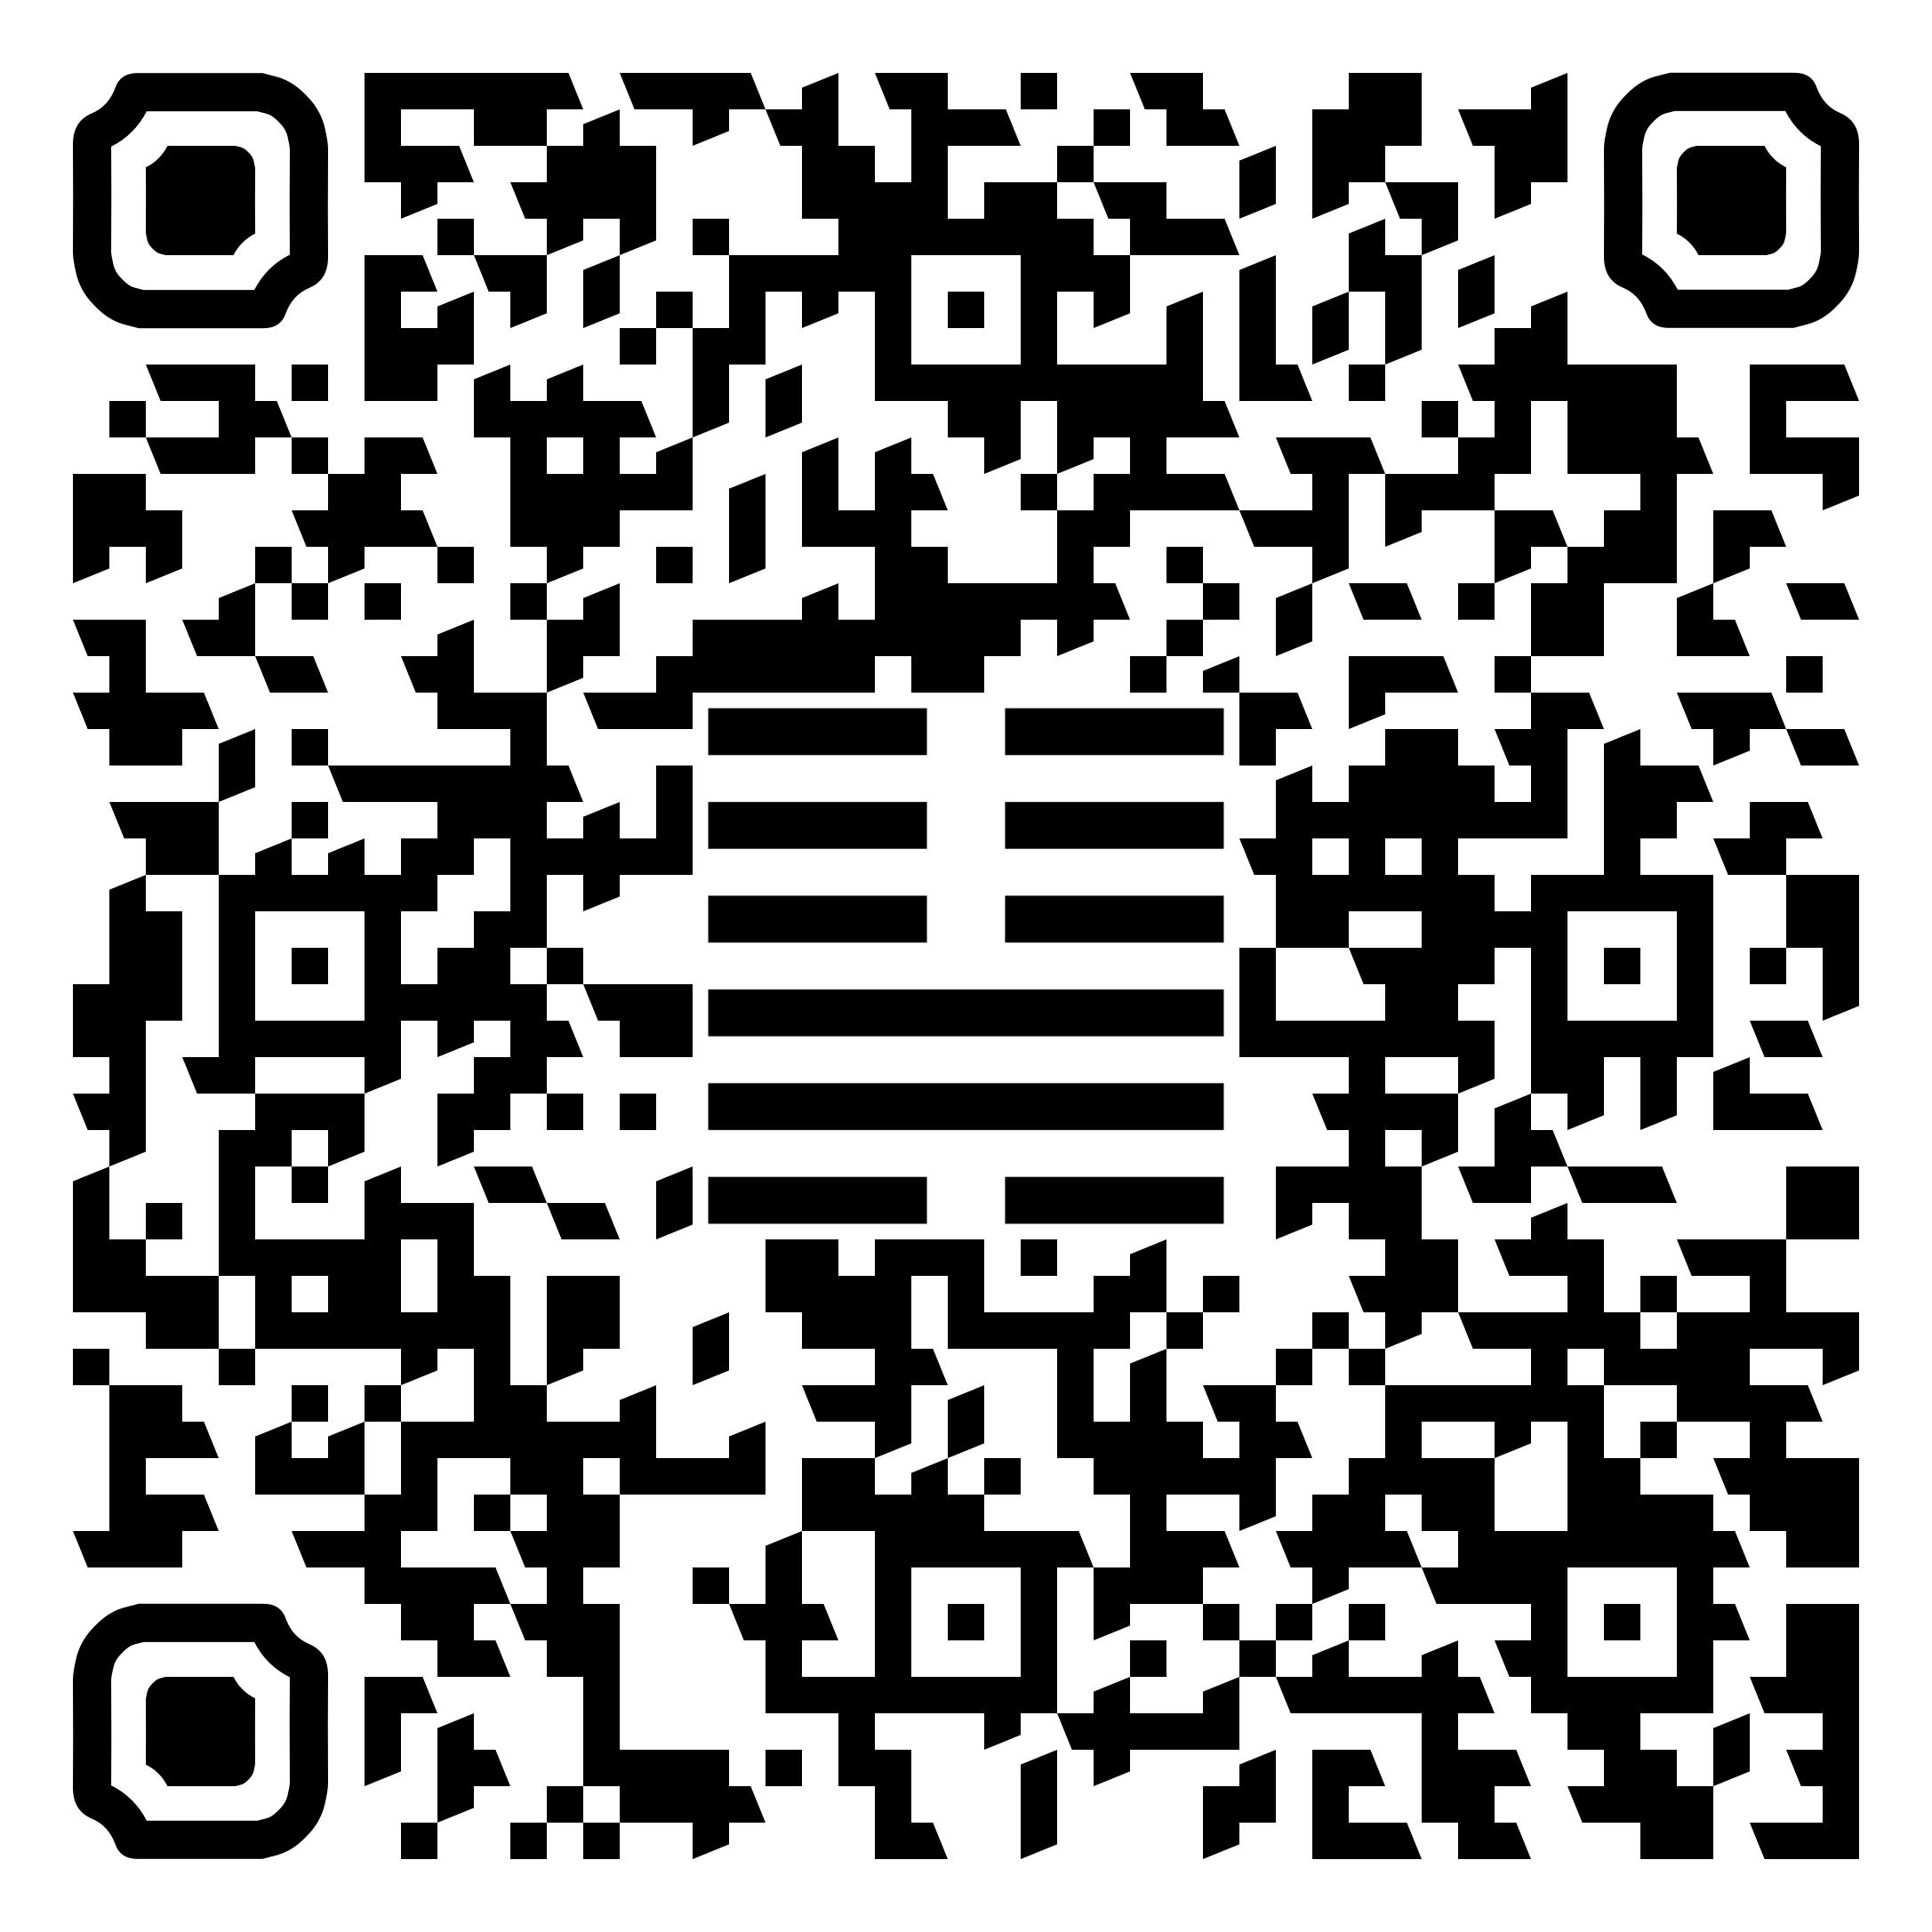 qr-code-46.png